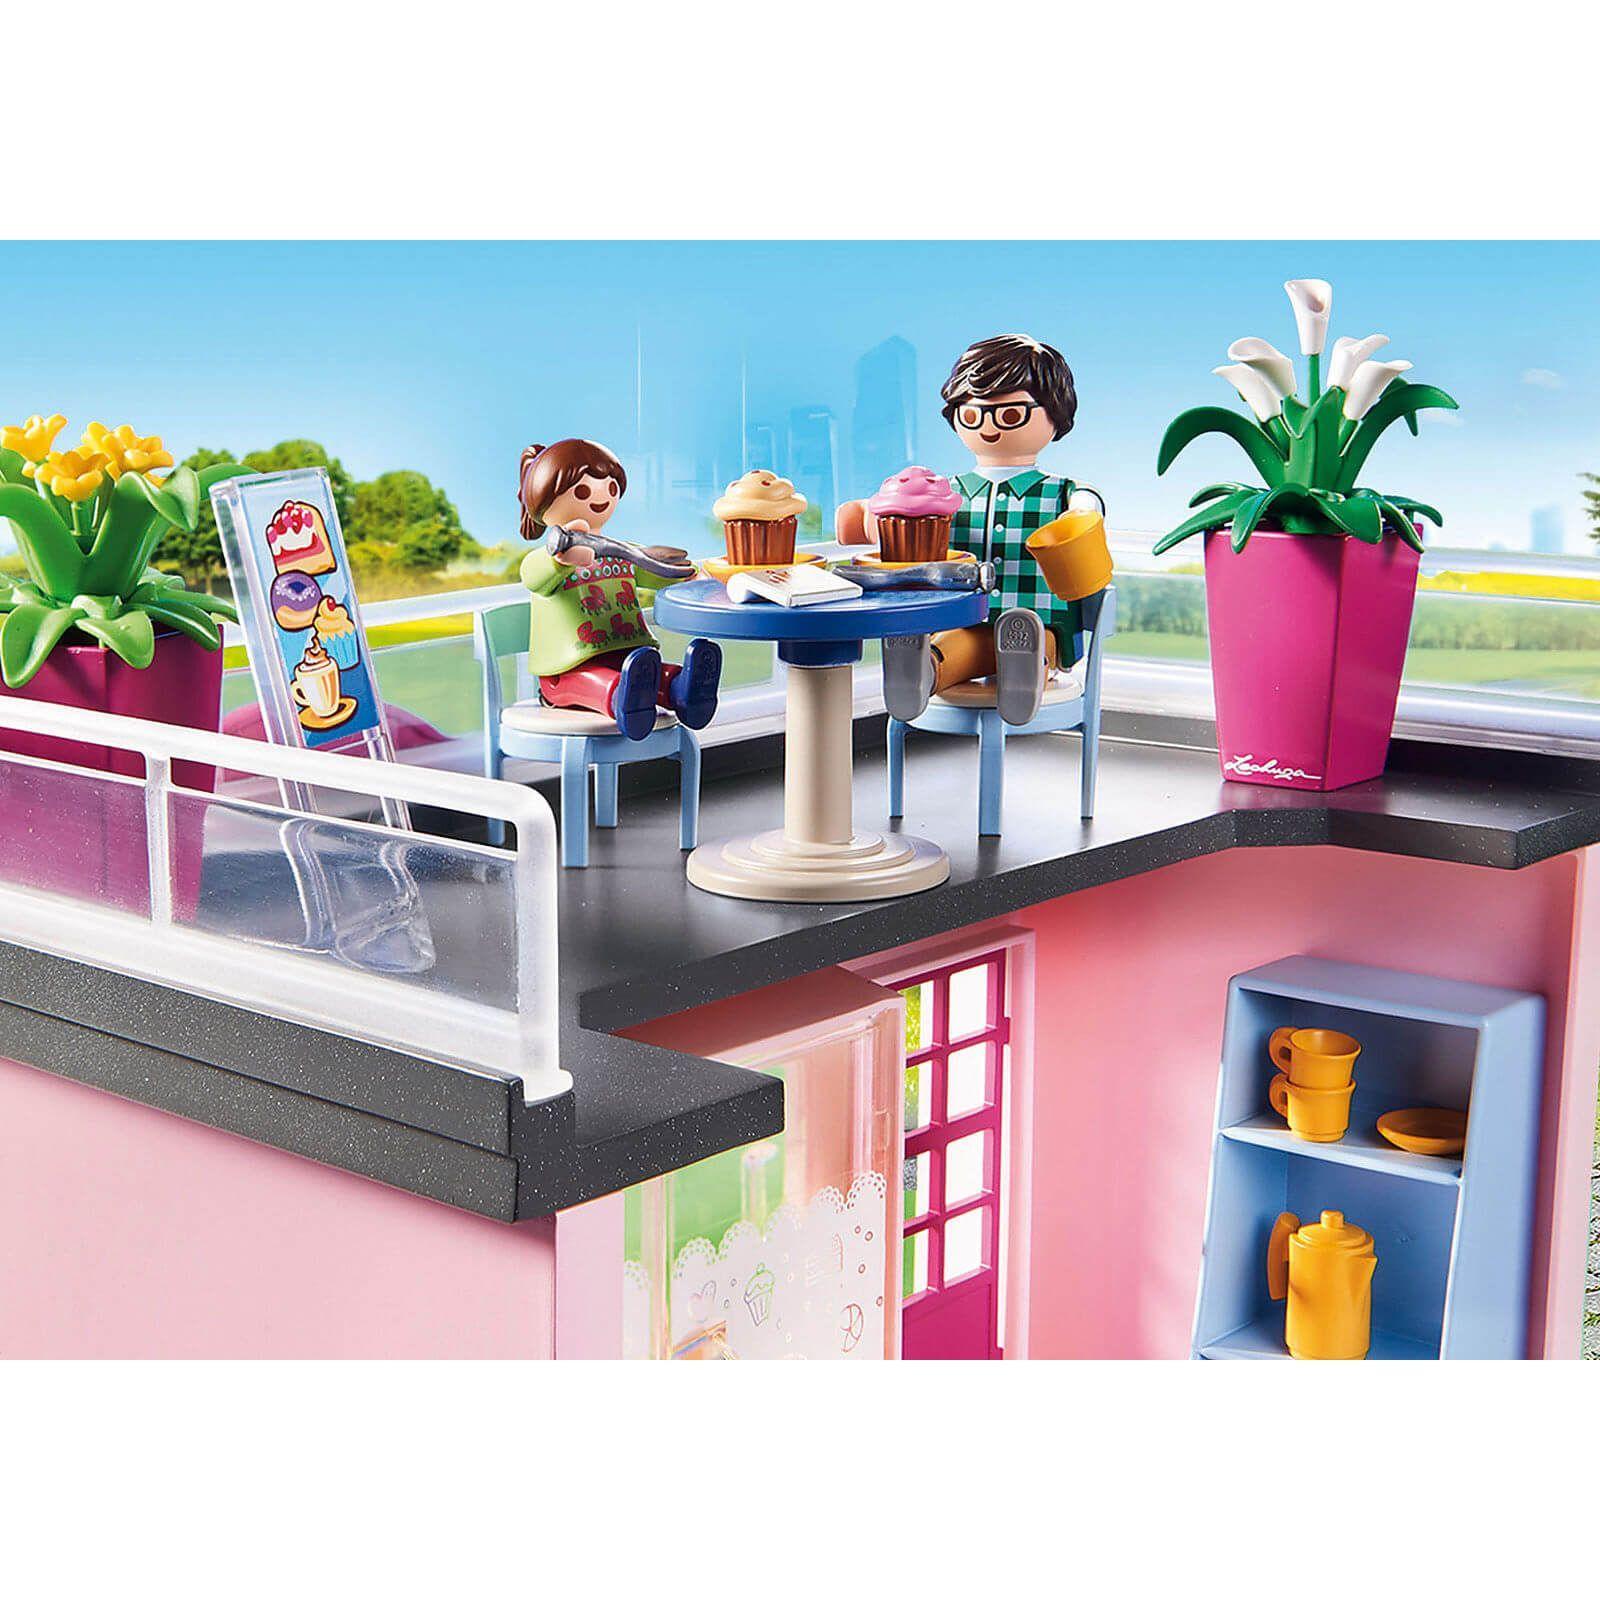 Playmobil City Life My Cafe 70015 Cafe City Life Playmobil Playmobil Flower Shop Tree House Kids